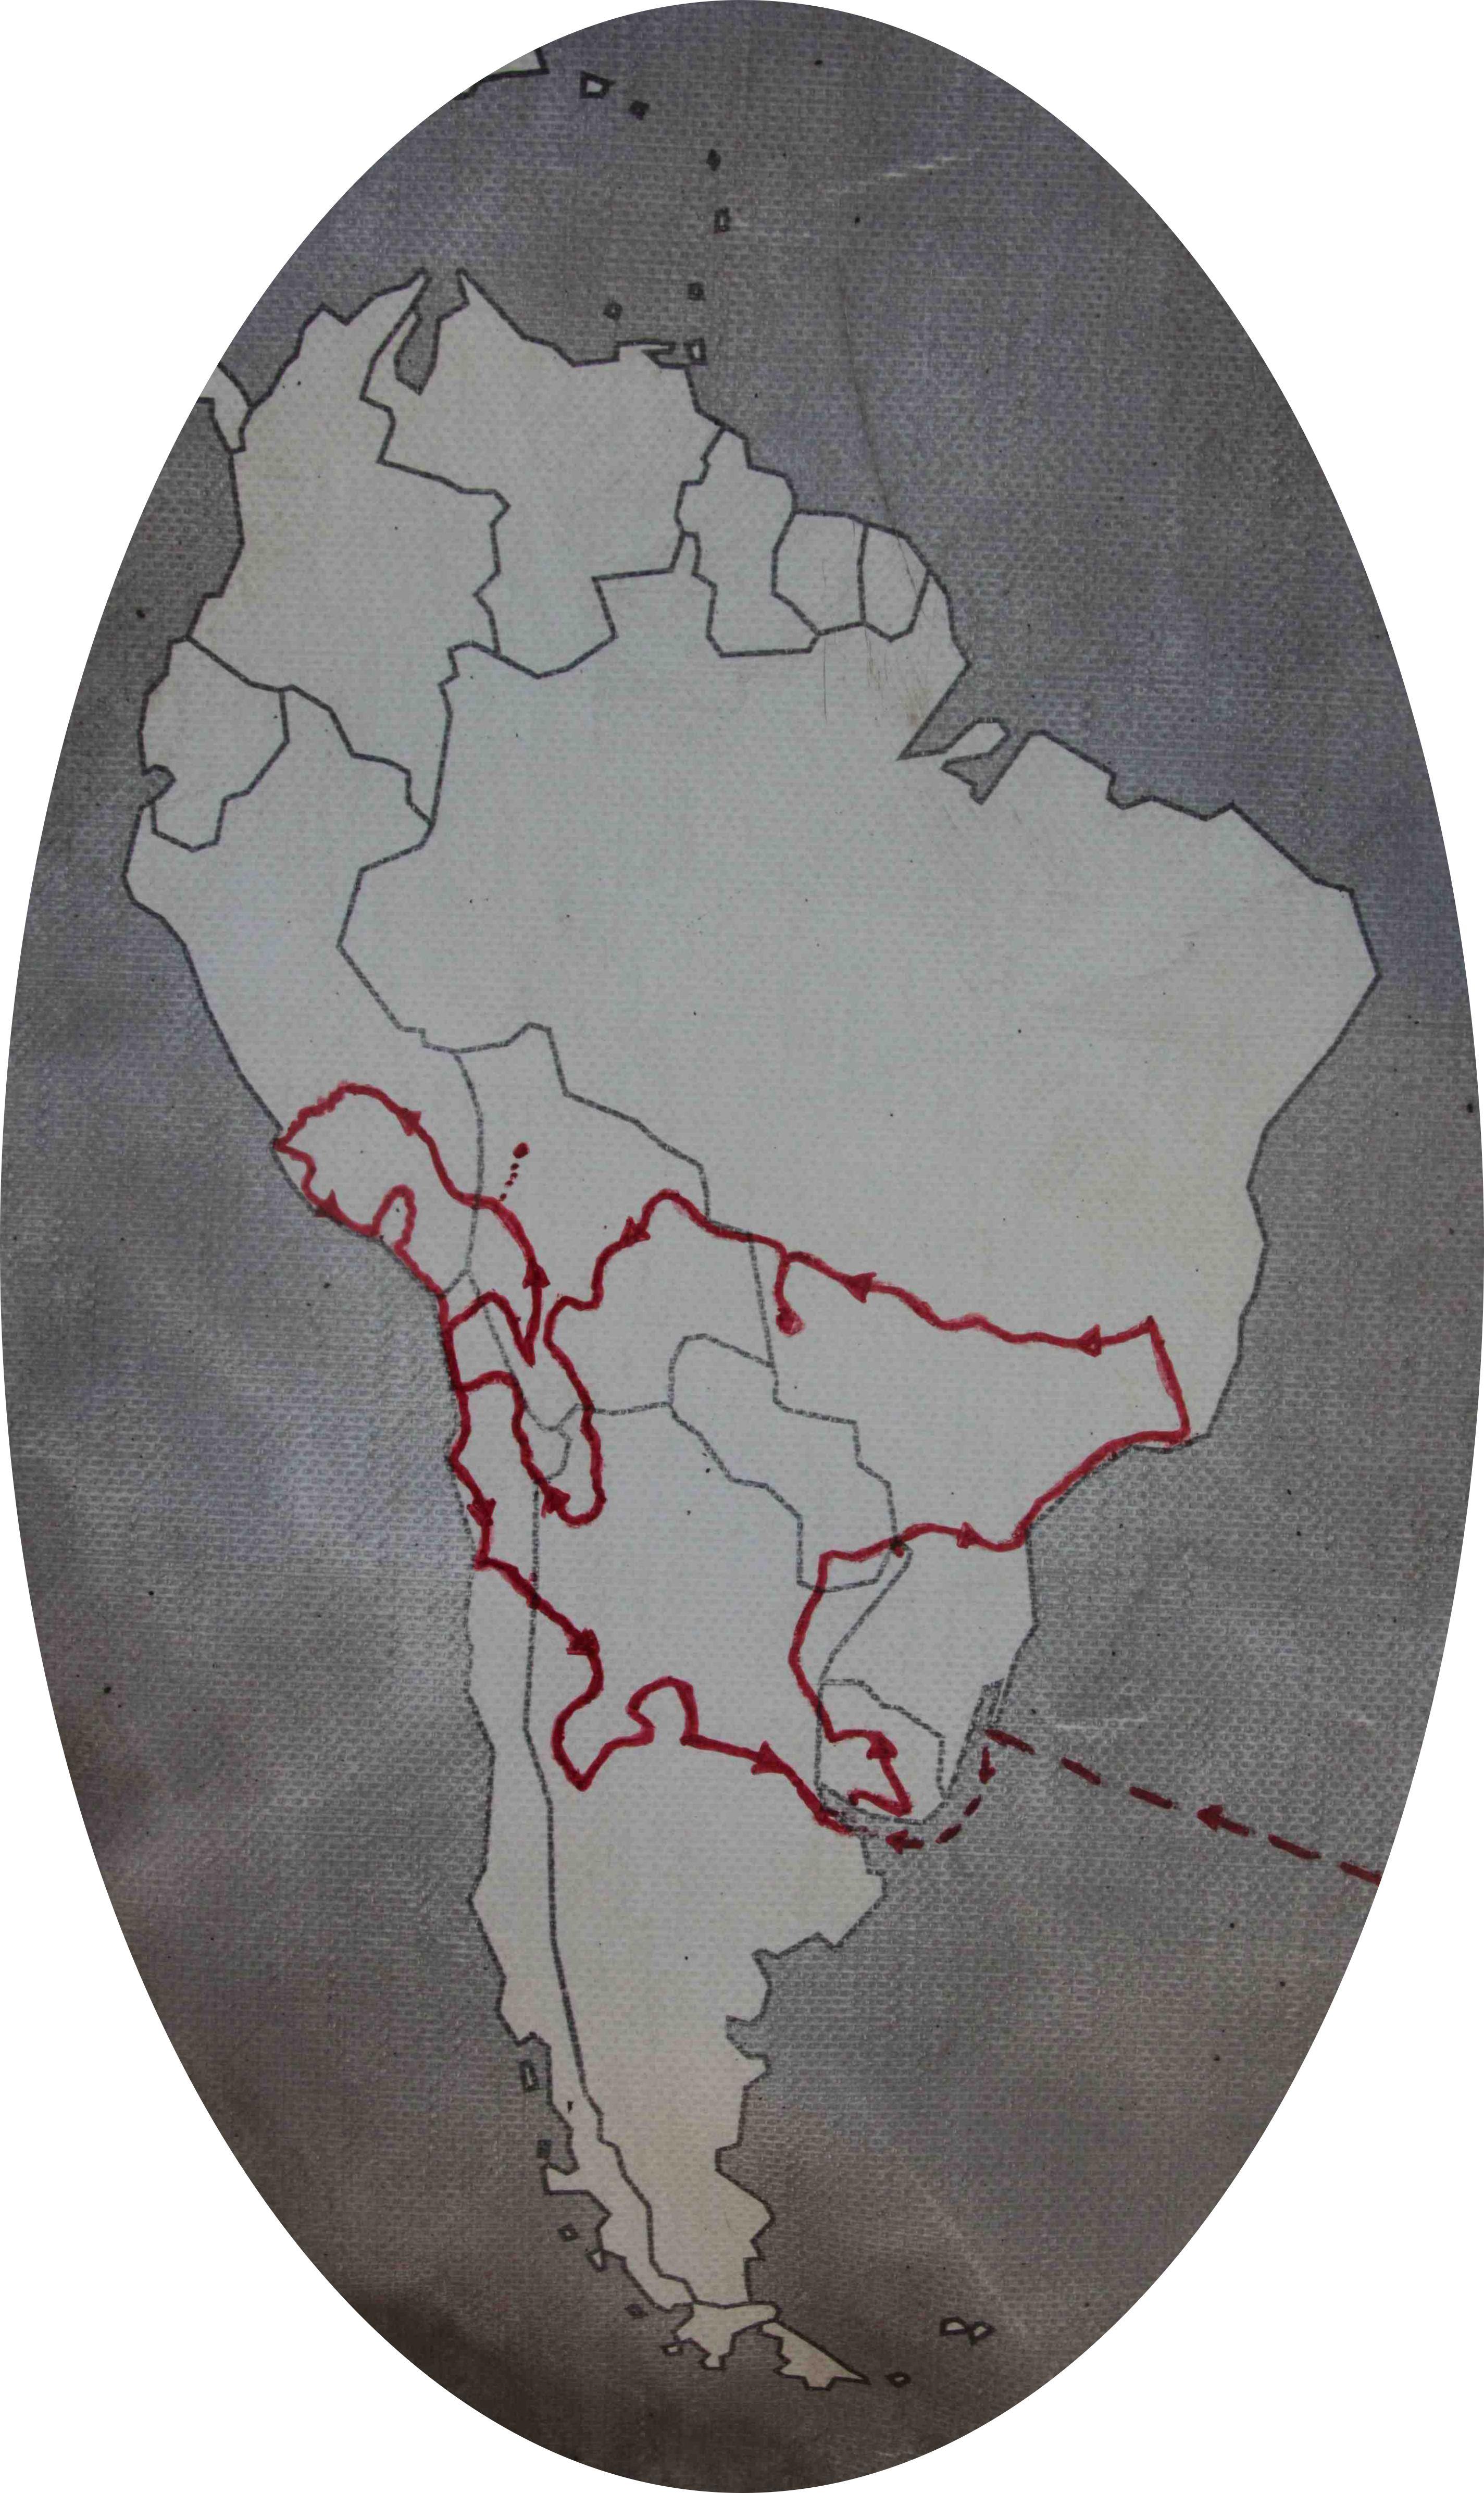 ibeX route Zuid Amerika 2014